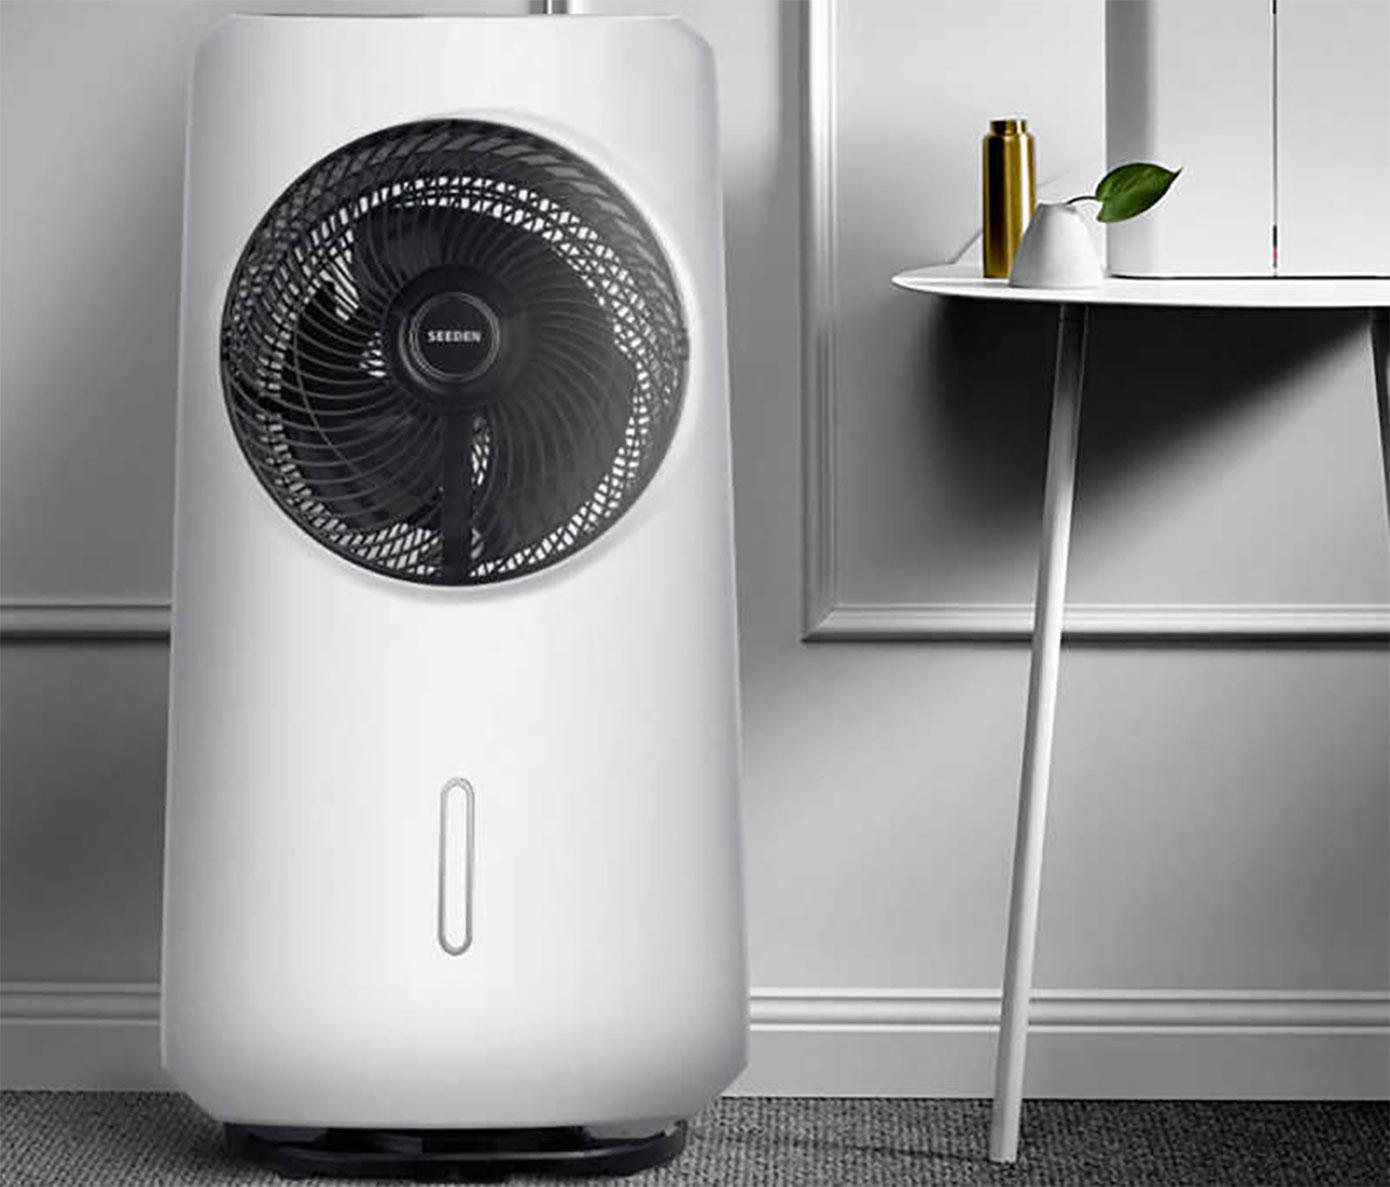 Opisanie Ventilyator S Uvlazhnitelem Vozduha Seeden Fog Type Cooling Fan 1s 5